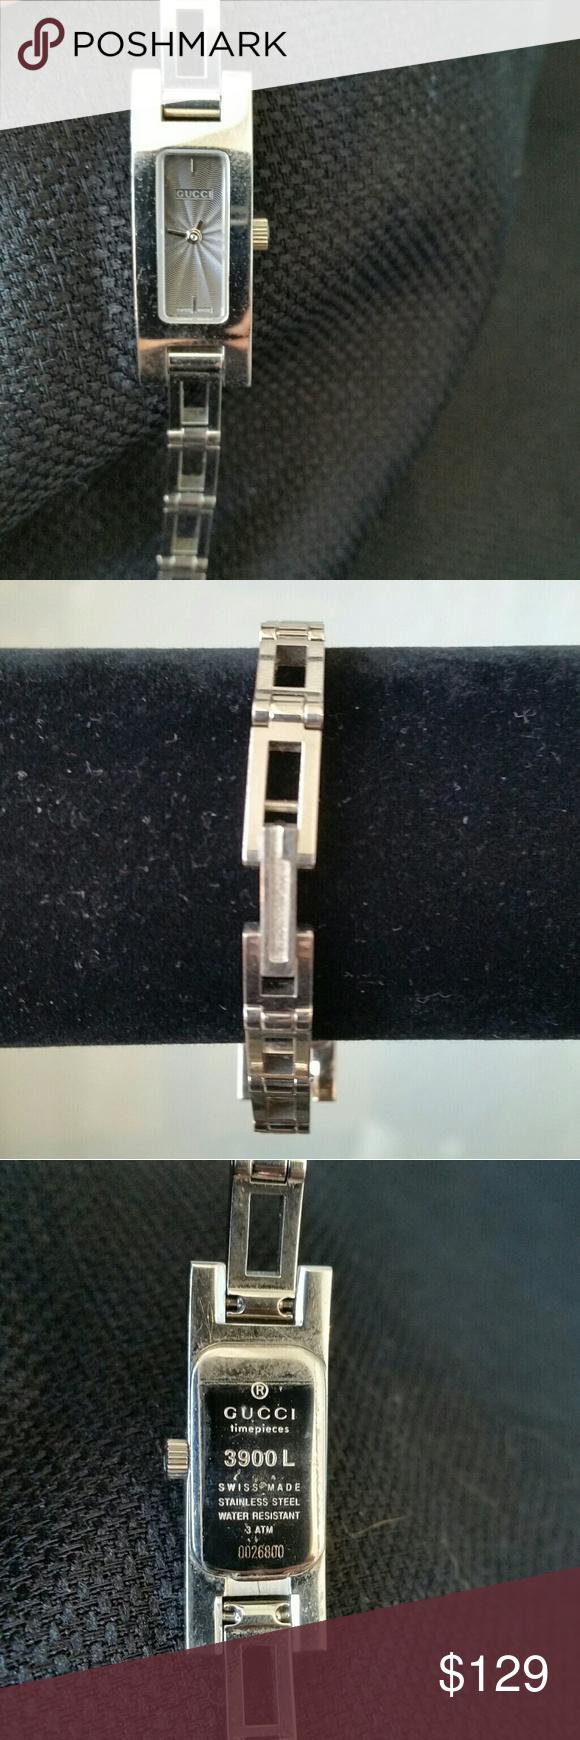 648394c7b552de Vintage Silver Gucci Wristwatch 3900 L Vintage Gucci Watch Very Good Pre- owned Condition Features